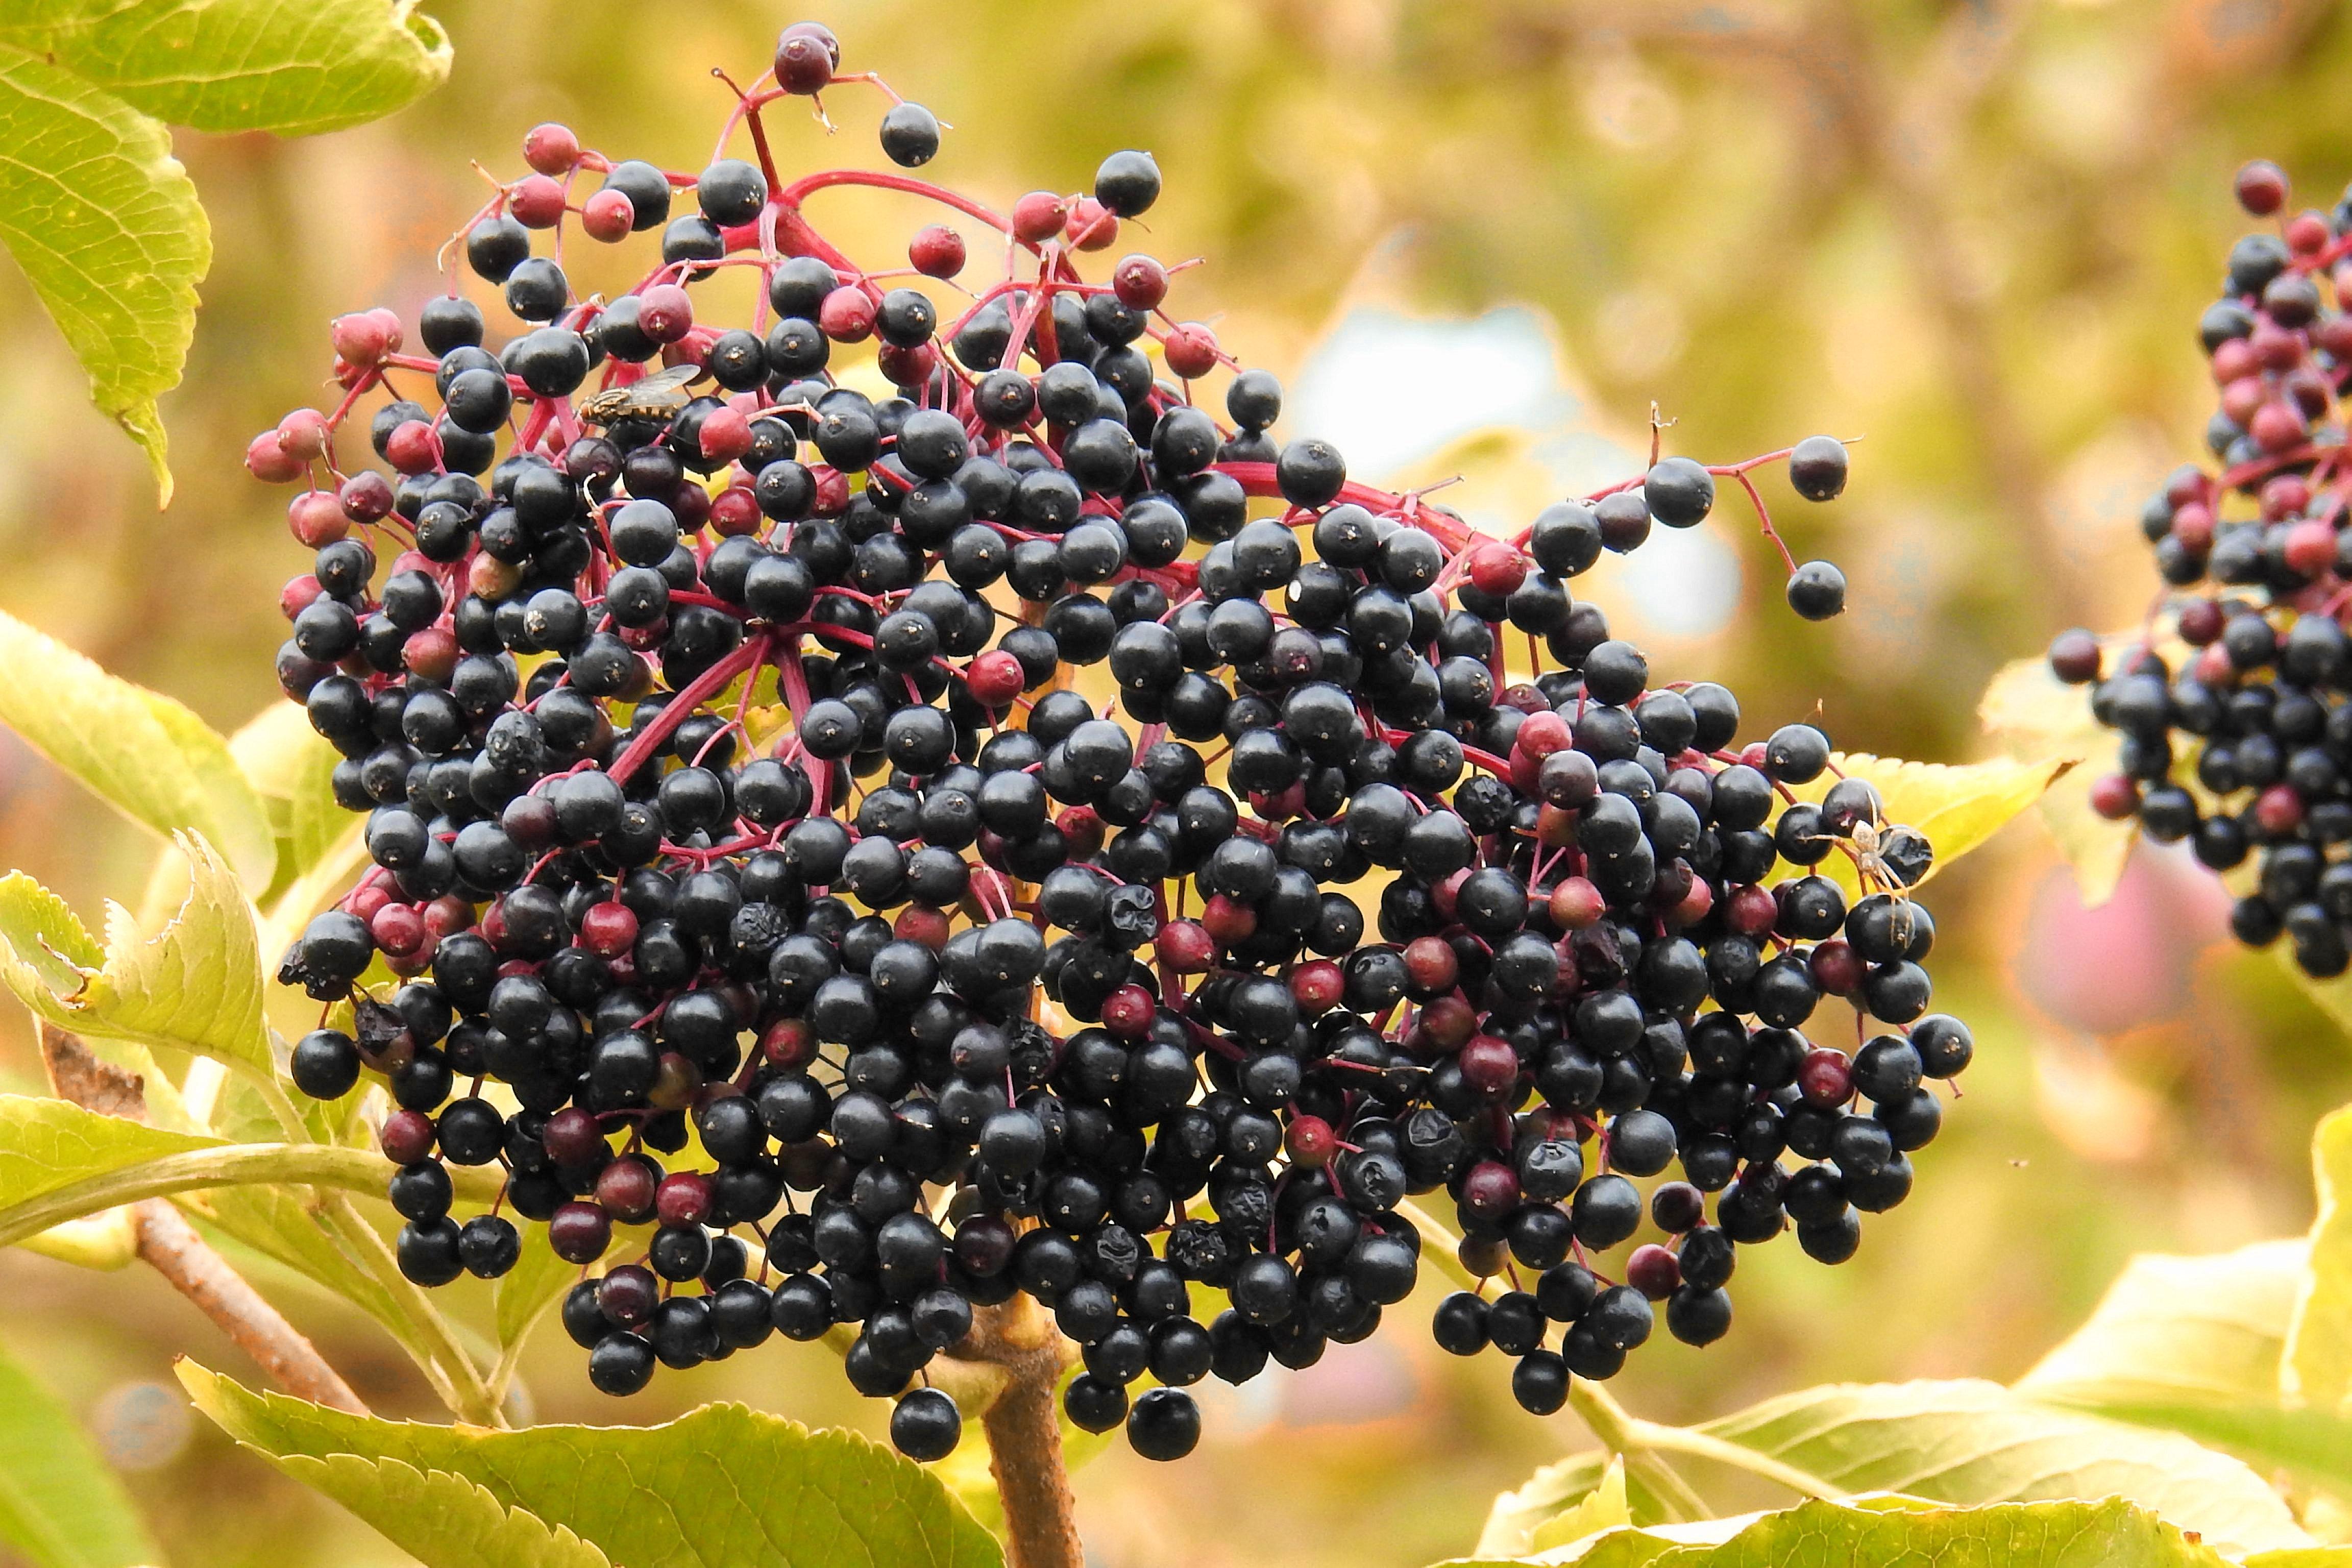 Картинки ягоды бузины черной